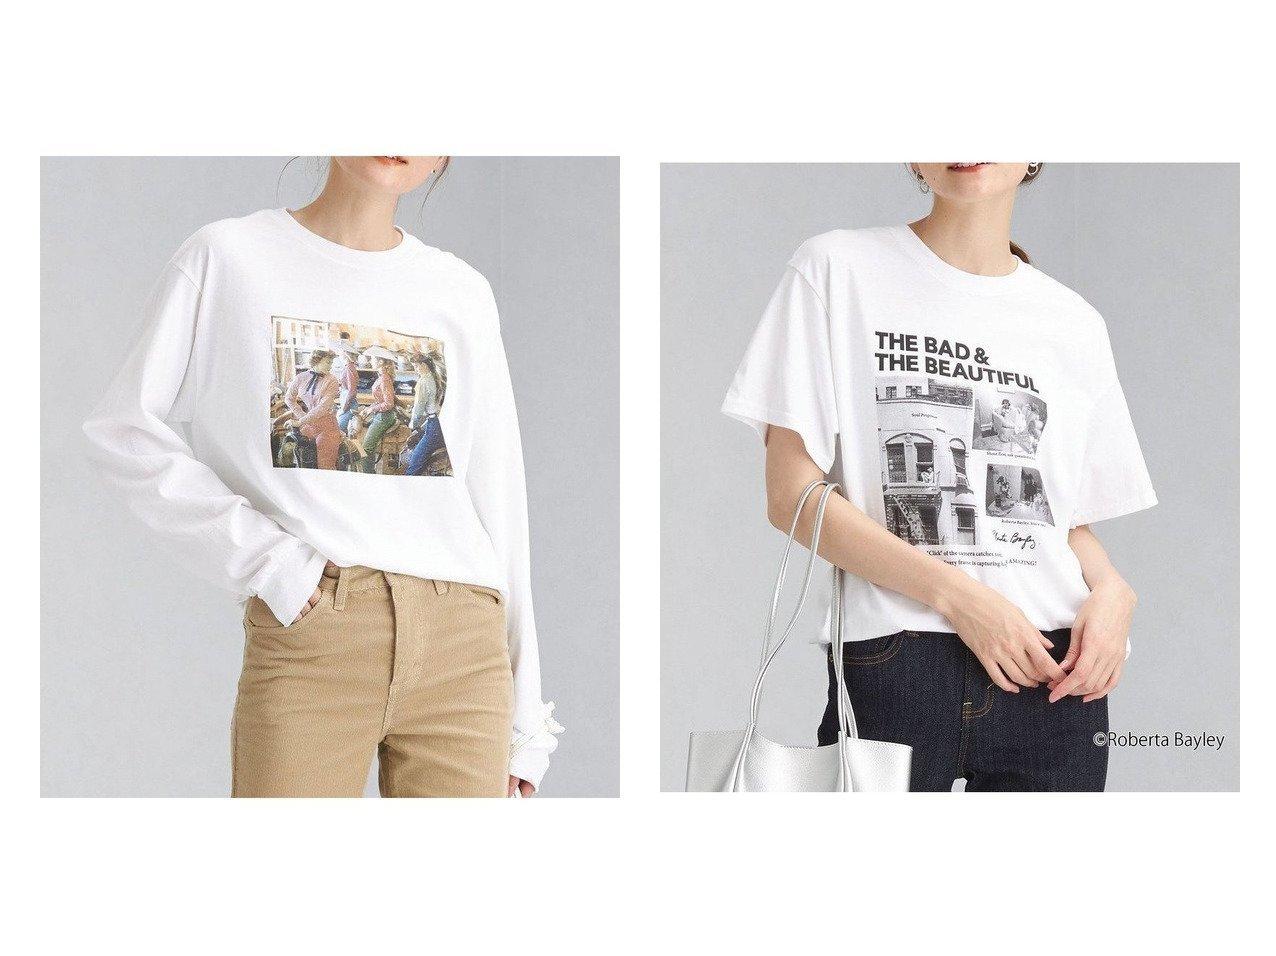 【green label relaxing / UNITED ARROWS/グリーンレーベル リラクシング / ユナイテッドアローズ】の【別注】 GOOD ROCK SPEED ROBERTA BAYLEY ショートスリーブ Tシャツ&【別注】 GOOD ROCK SPEED LIFE ロングスリーブ フォト Tシャツ カットソー 別注・限定・コラボなど、おすすめ!人気、トレンド・レディースファッションの通販 おすすめで人気の流行・トレンド、ファッションの通販商品 インテリア・家具・メンズファッション・キッズファッション・レディースファッション・服の通販 founy(ファニー) https://founy.com/ ファッション Fashion レディースファッション WOMEN トップス・カットソー Tops/Tshirt シャツ/ブラウス Shirts/Blouses ロング / Tシャツ T-Shirts カットソー Cut and Sewn インナー ヴィンテージ カットソー スペシャル スリーブ 雑誌 プリント 別注 モノトーン ロング NEW・新作・新着・新入荷 New Arrivals グラフィック ショート ニューヨーク 人気 フロント メッシュ おすすめ Recommend |ID:crp329100000061005